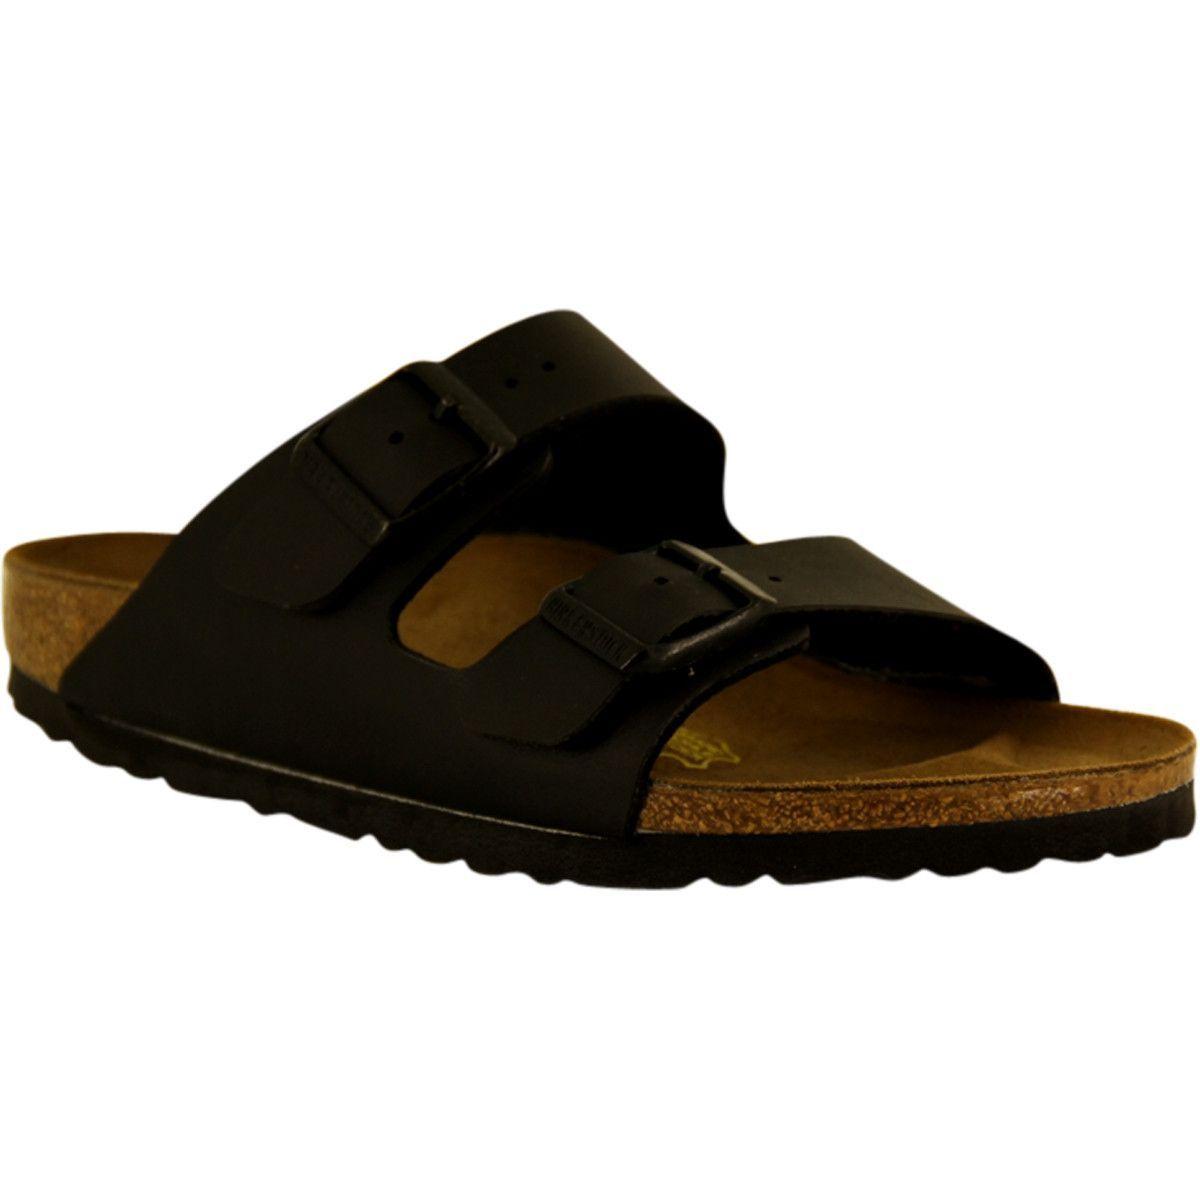 4f64376b9934 Birkenstock - Unisex Arizona Classic Footbed Sandals - Black Birko-Flor